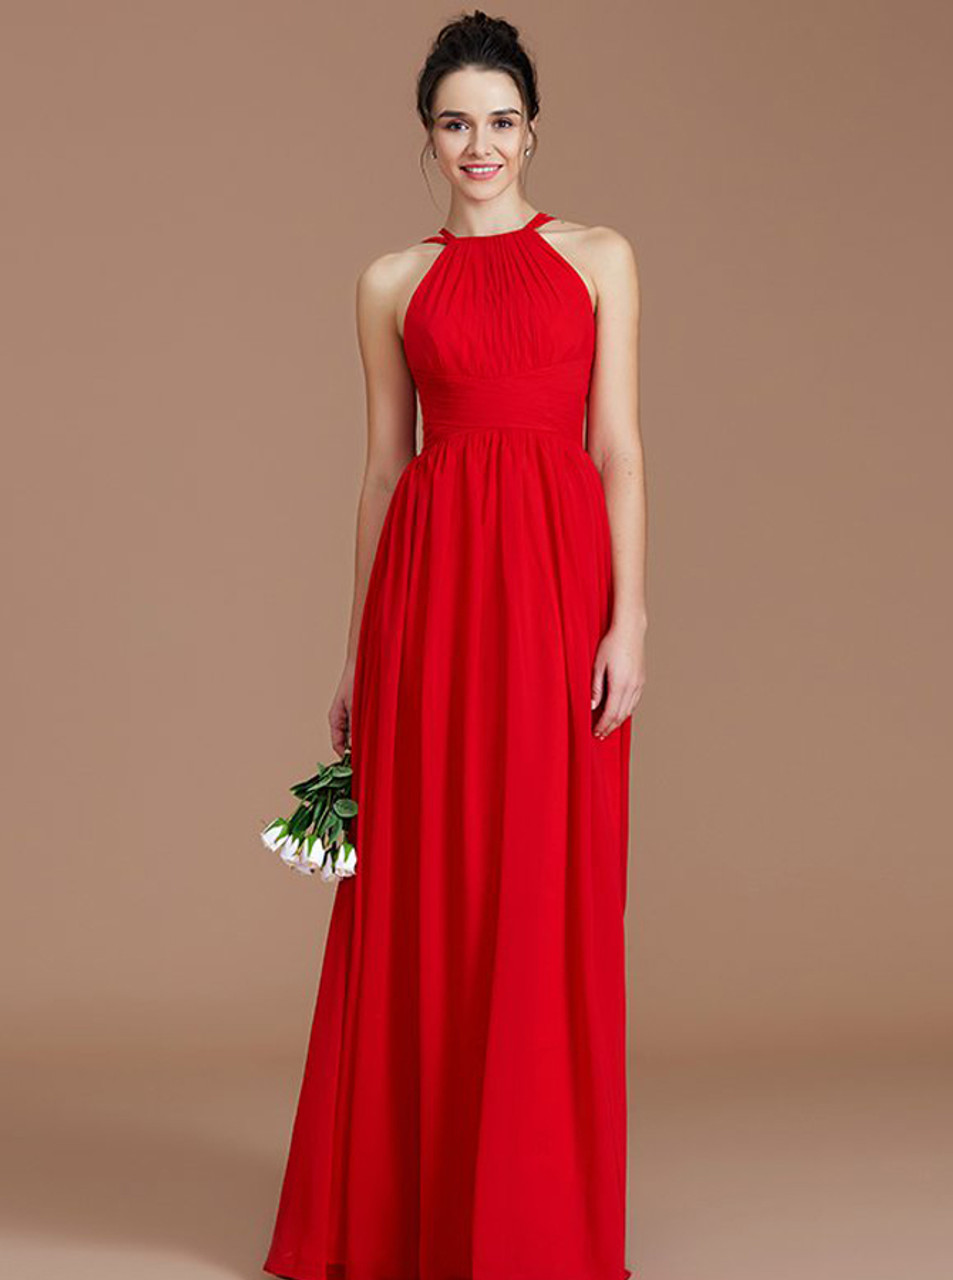 Red Modest Floor Length Bridesmaid Dresses